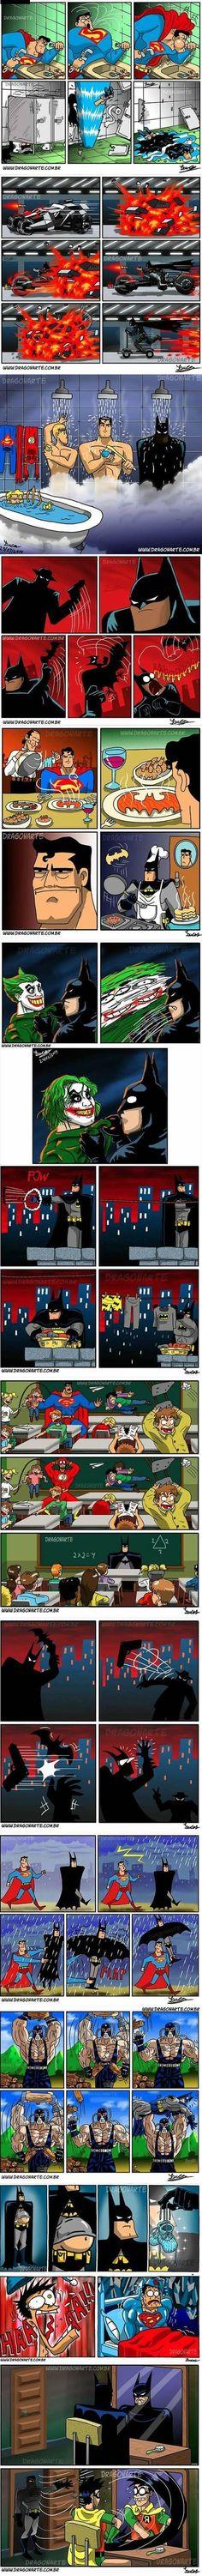 Some of the funniest Dragonartes Batman comics - Imgur